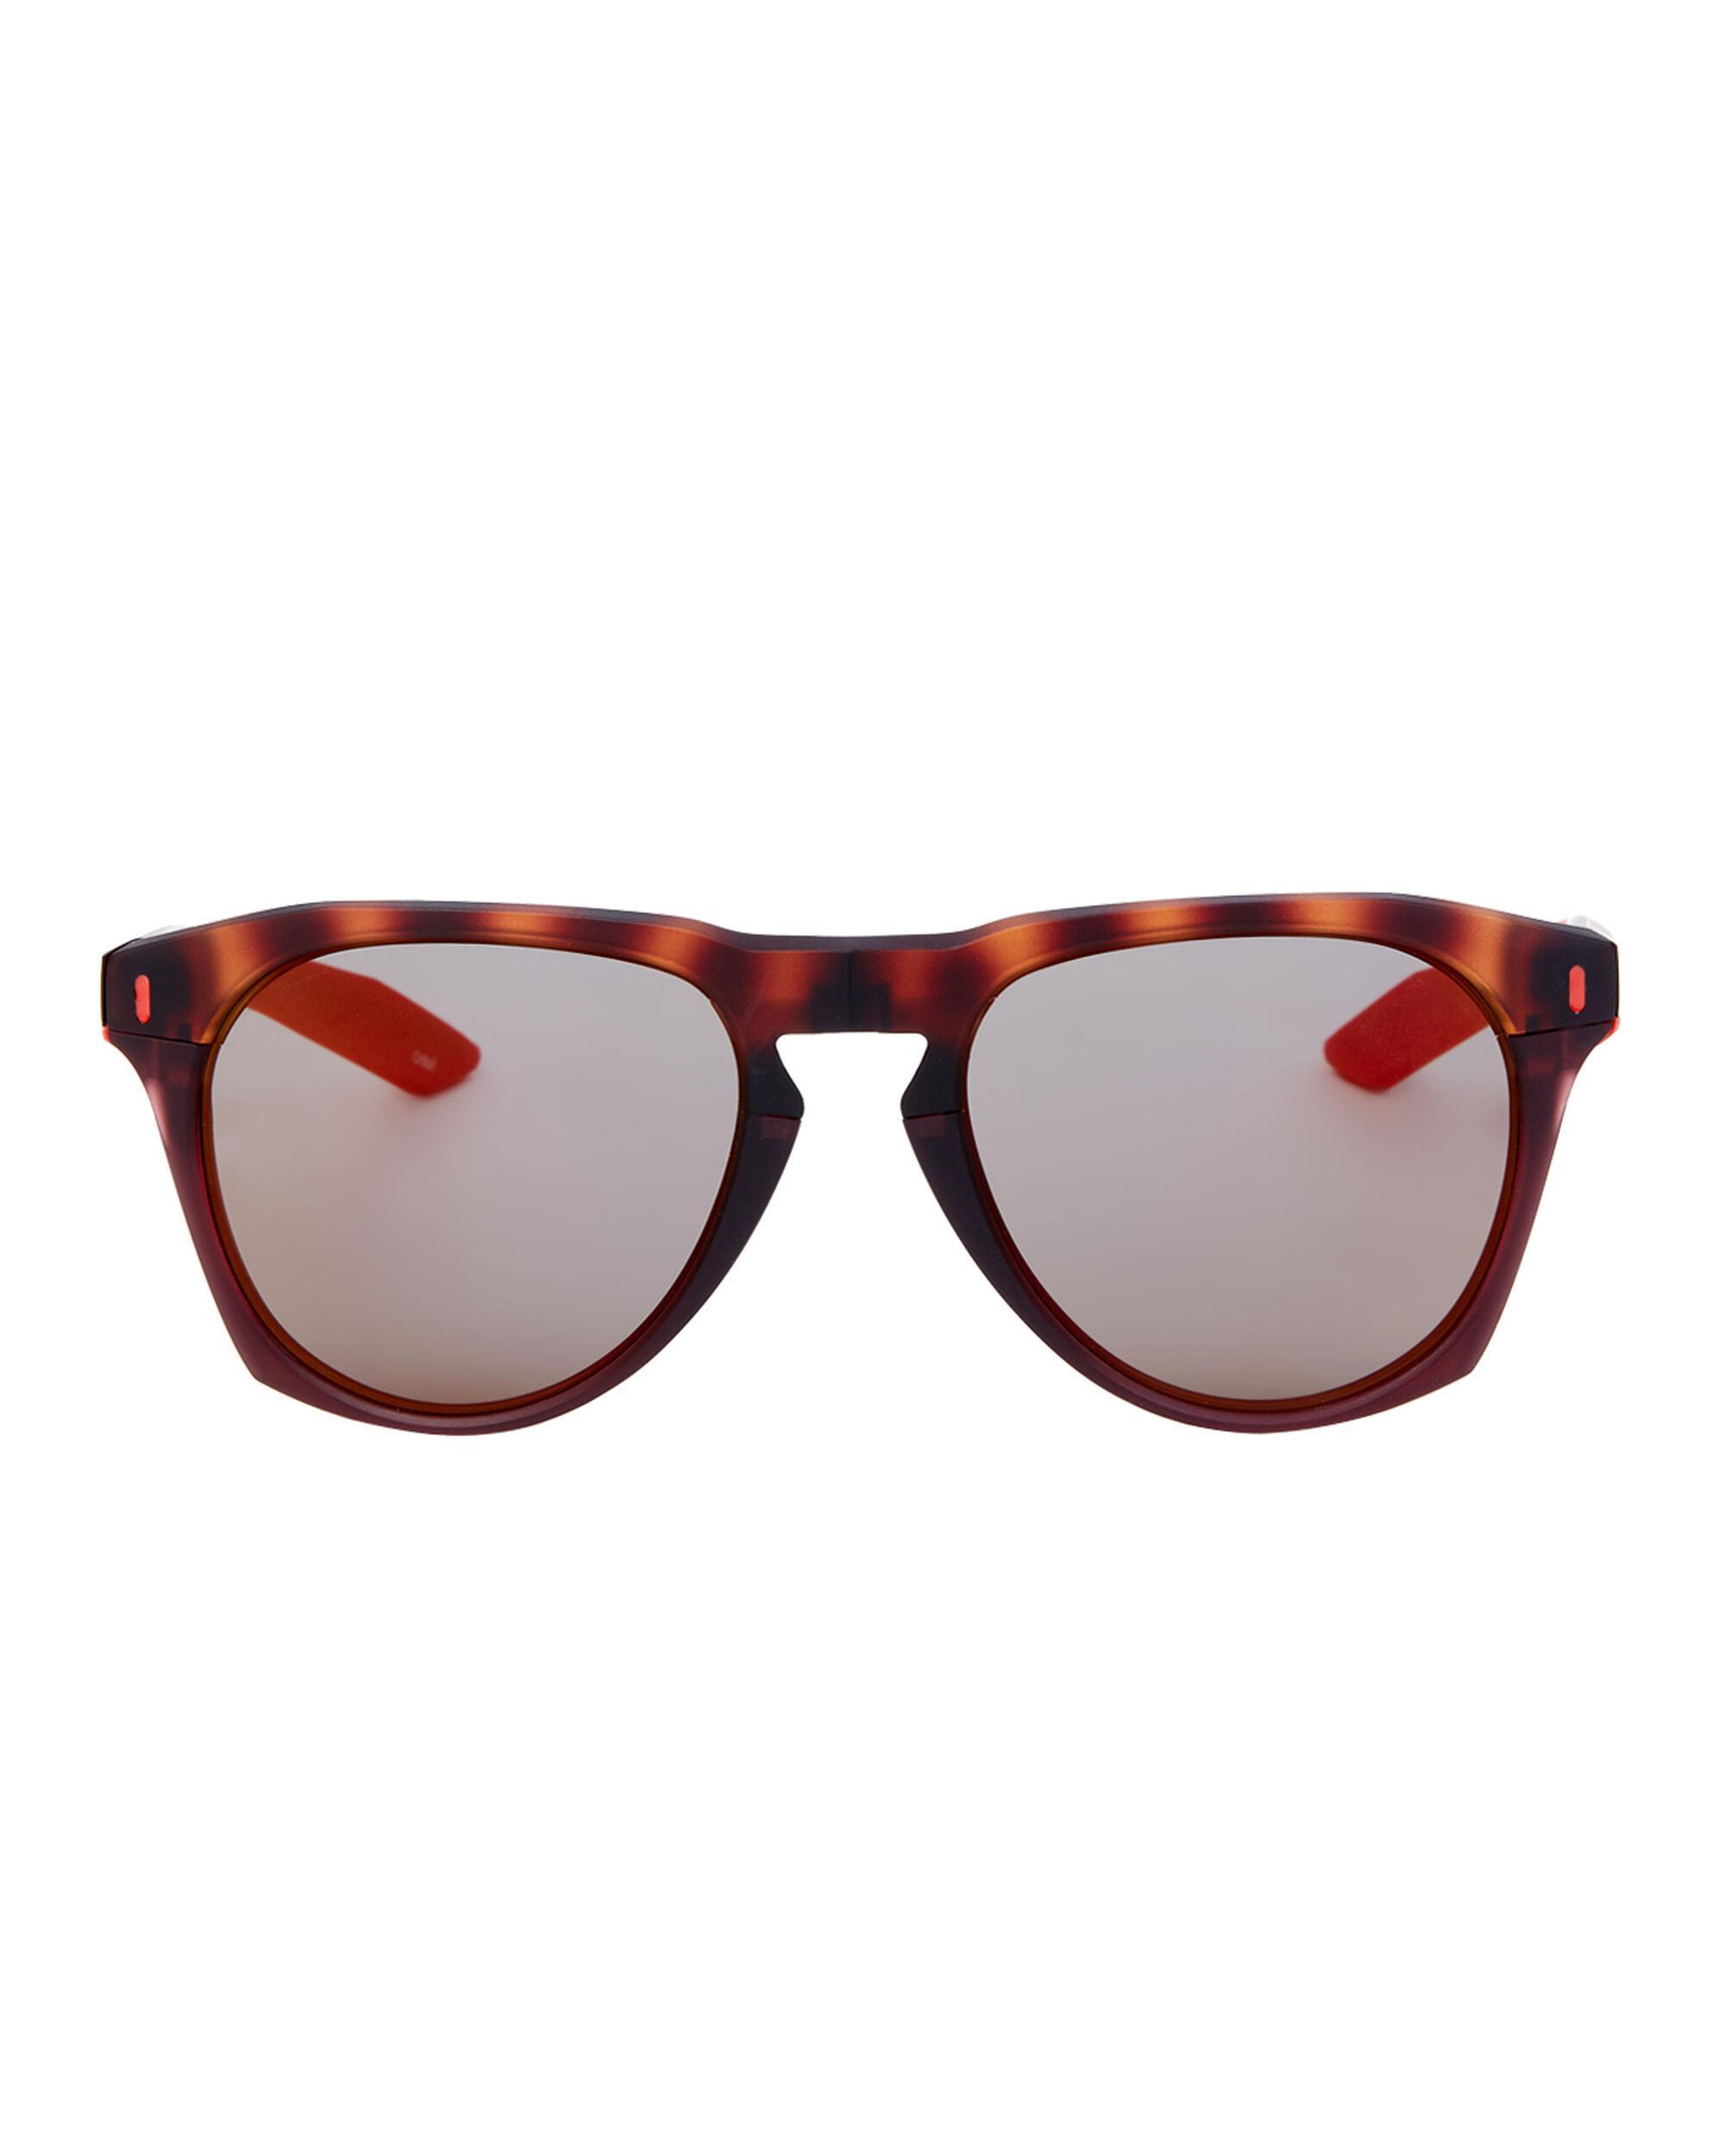 9ef0e4c70ea0 Nike Ev1020 Tortoiseshell-look & Coral Essential Navigator Sunglasses in  Brown for Men - Lyst